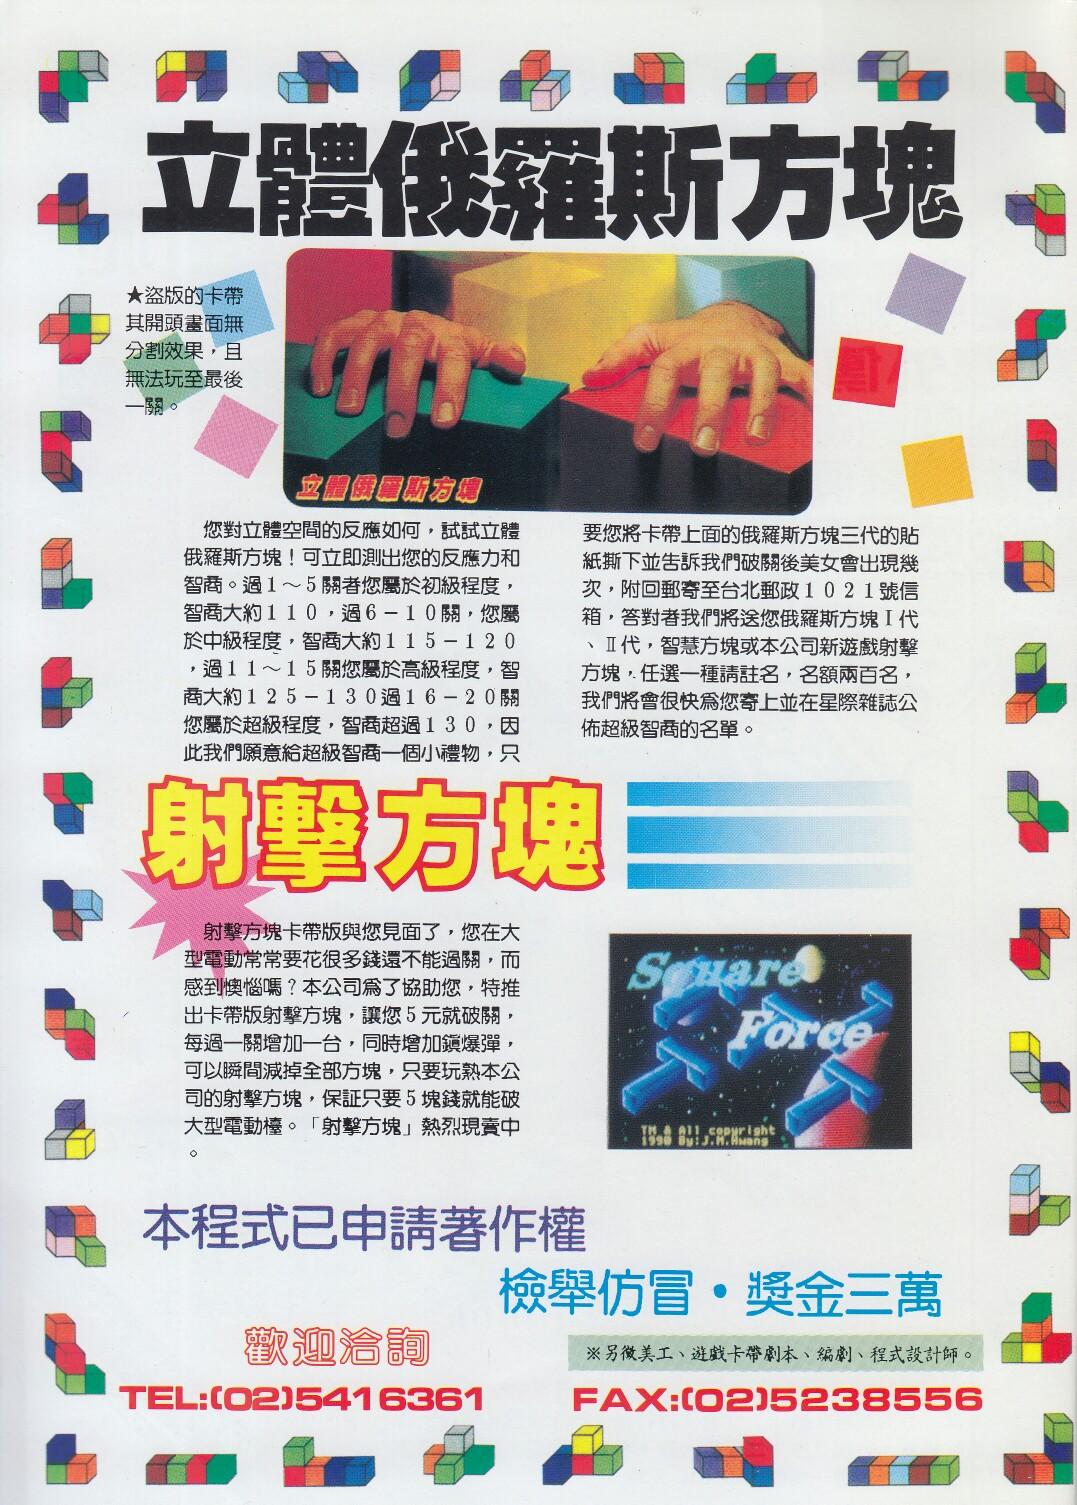 Jujing Electronics